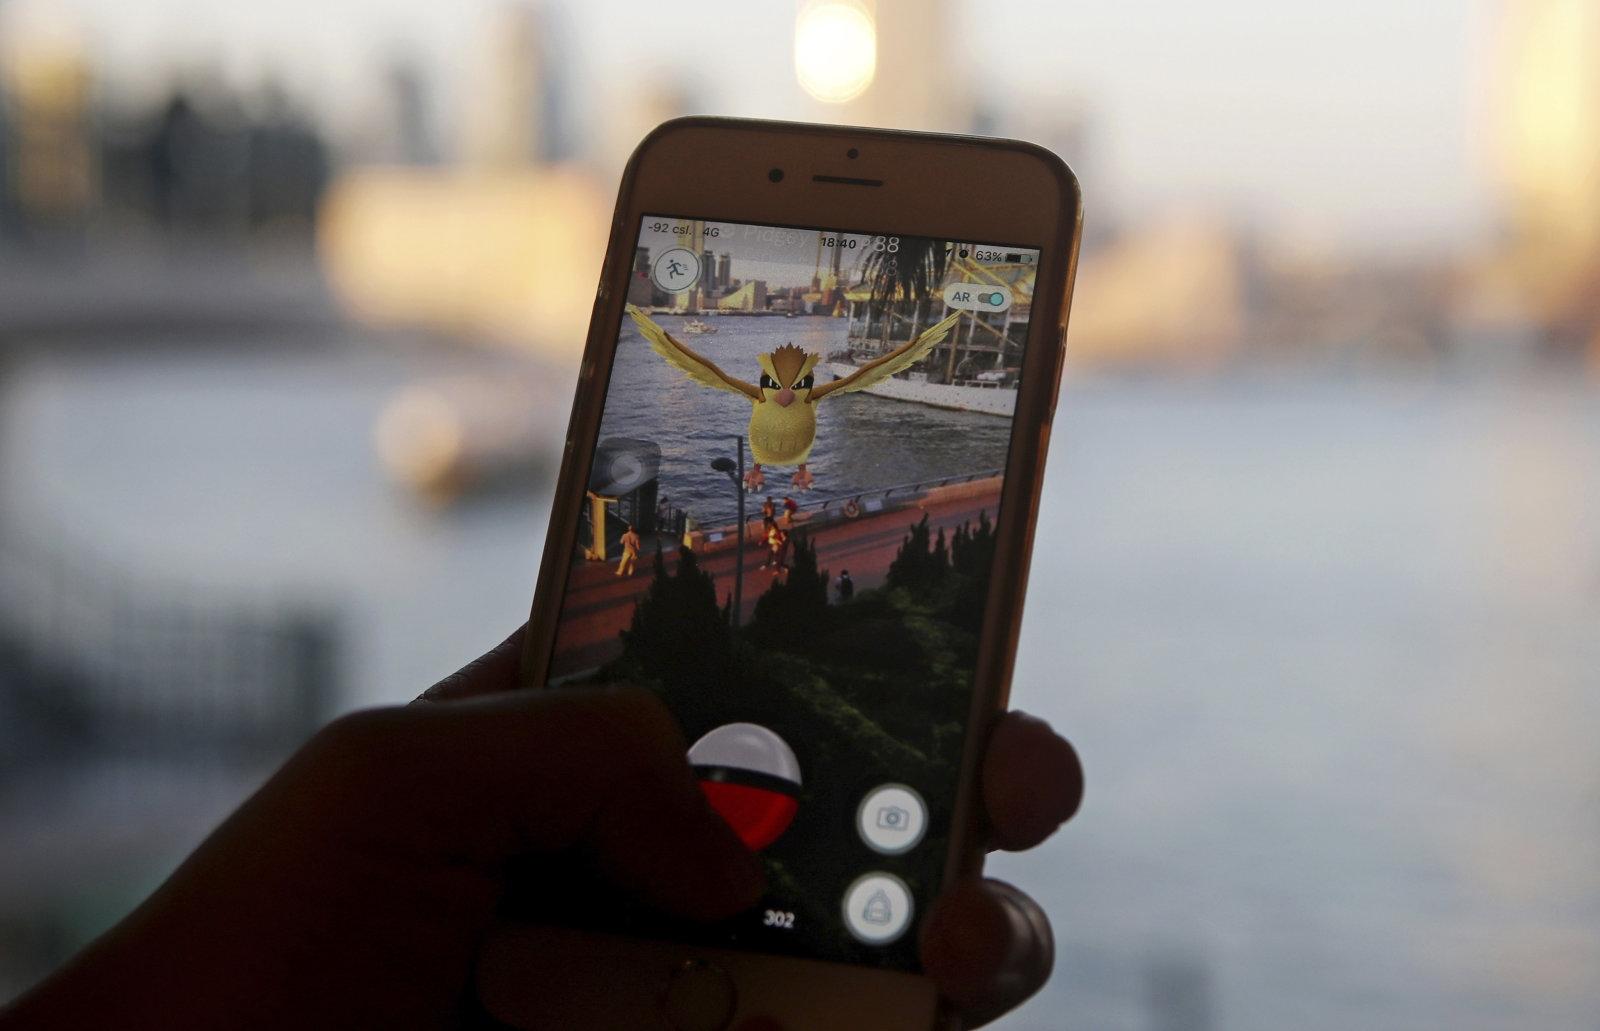 'Pokémon Go' settlement promises action on nuisance Pokéstops   DeviceDaily.com